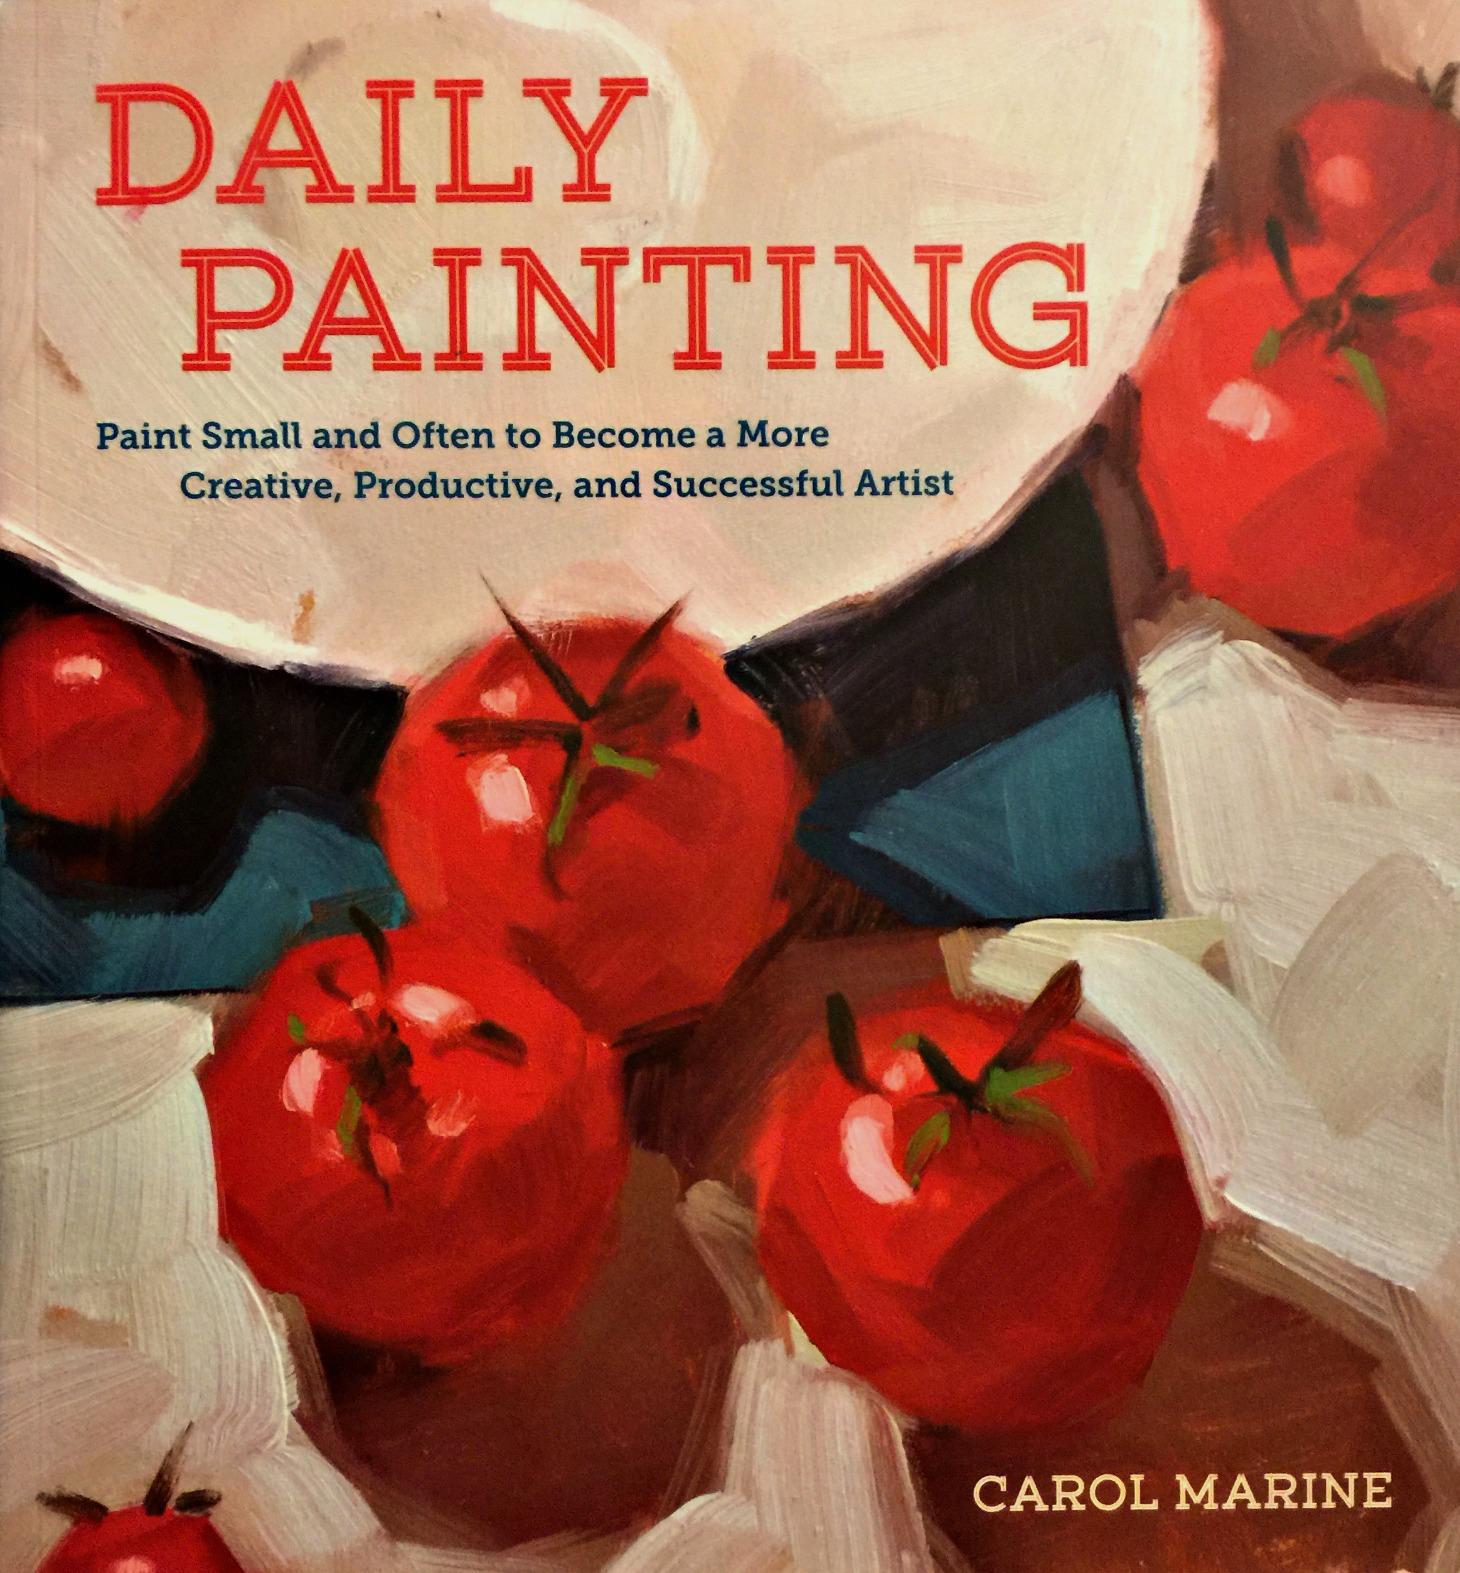 Carol Marine's Excellent Book